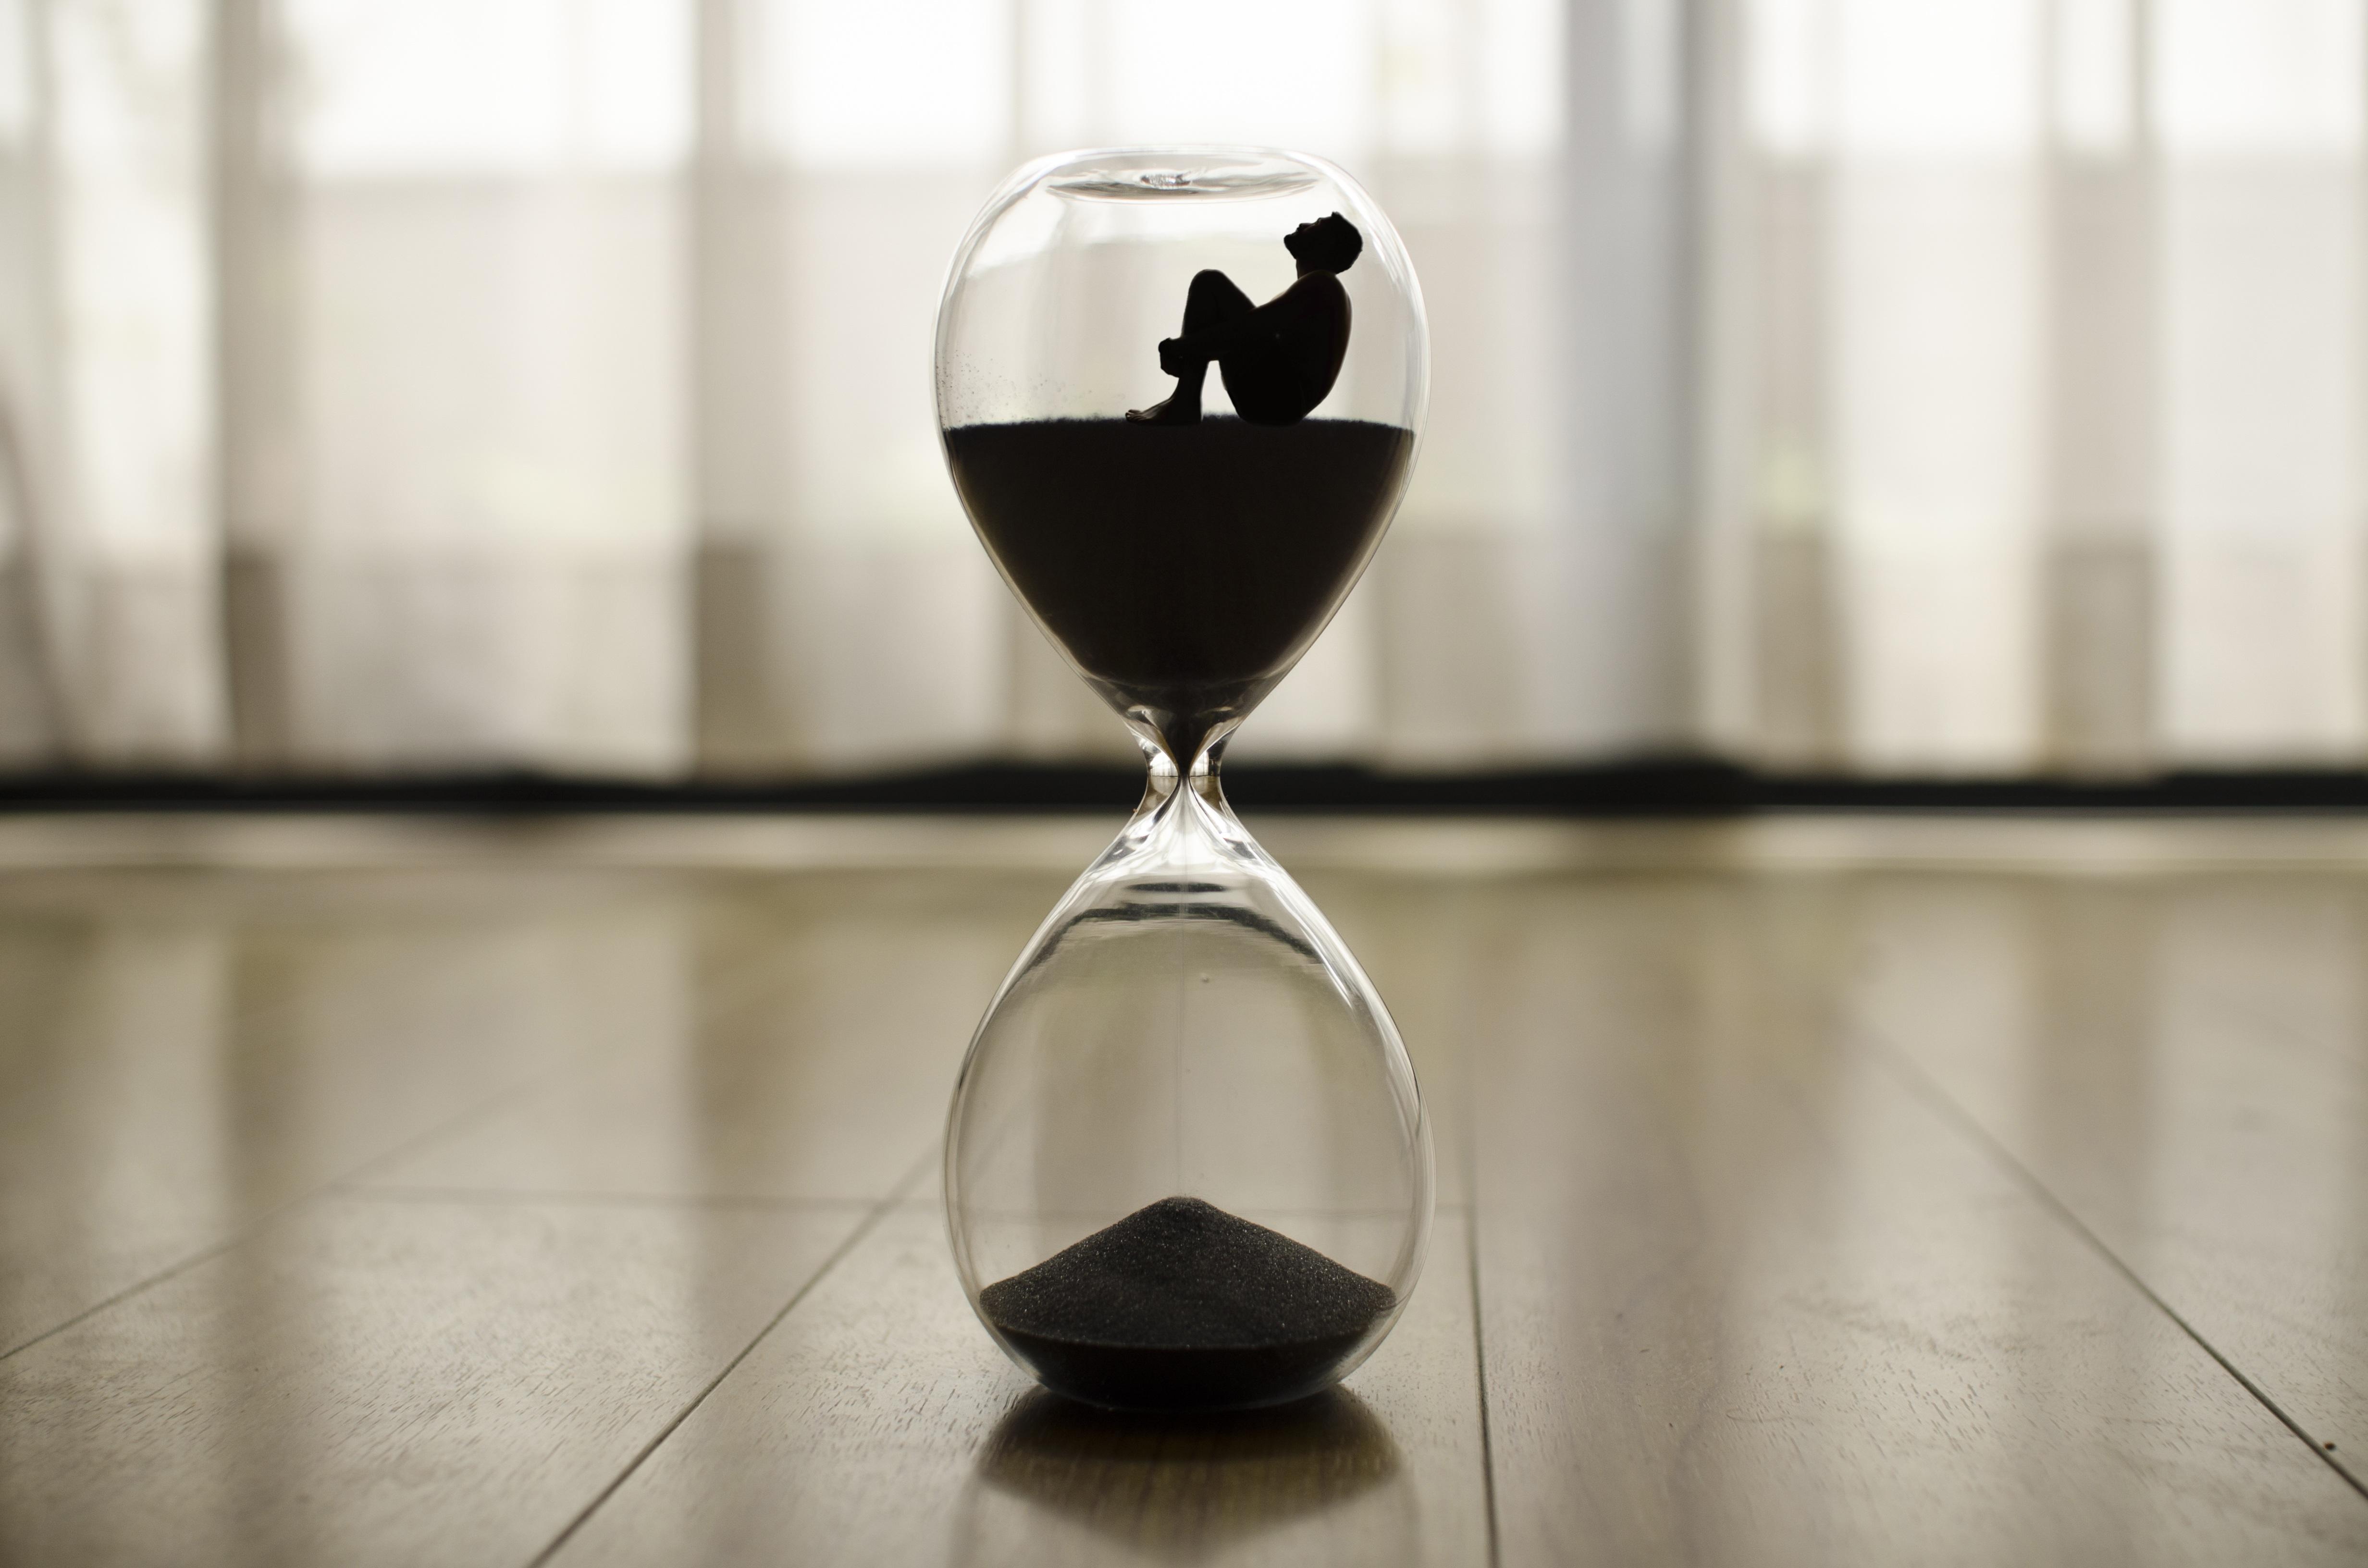 Fotos Gratis Blanco Vaso Hora Negro Copa De Vino Forma Reloj